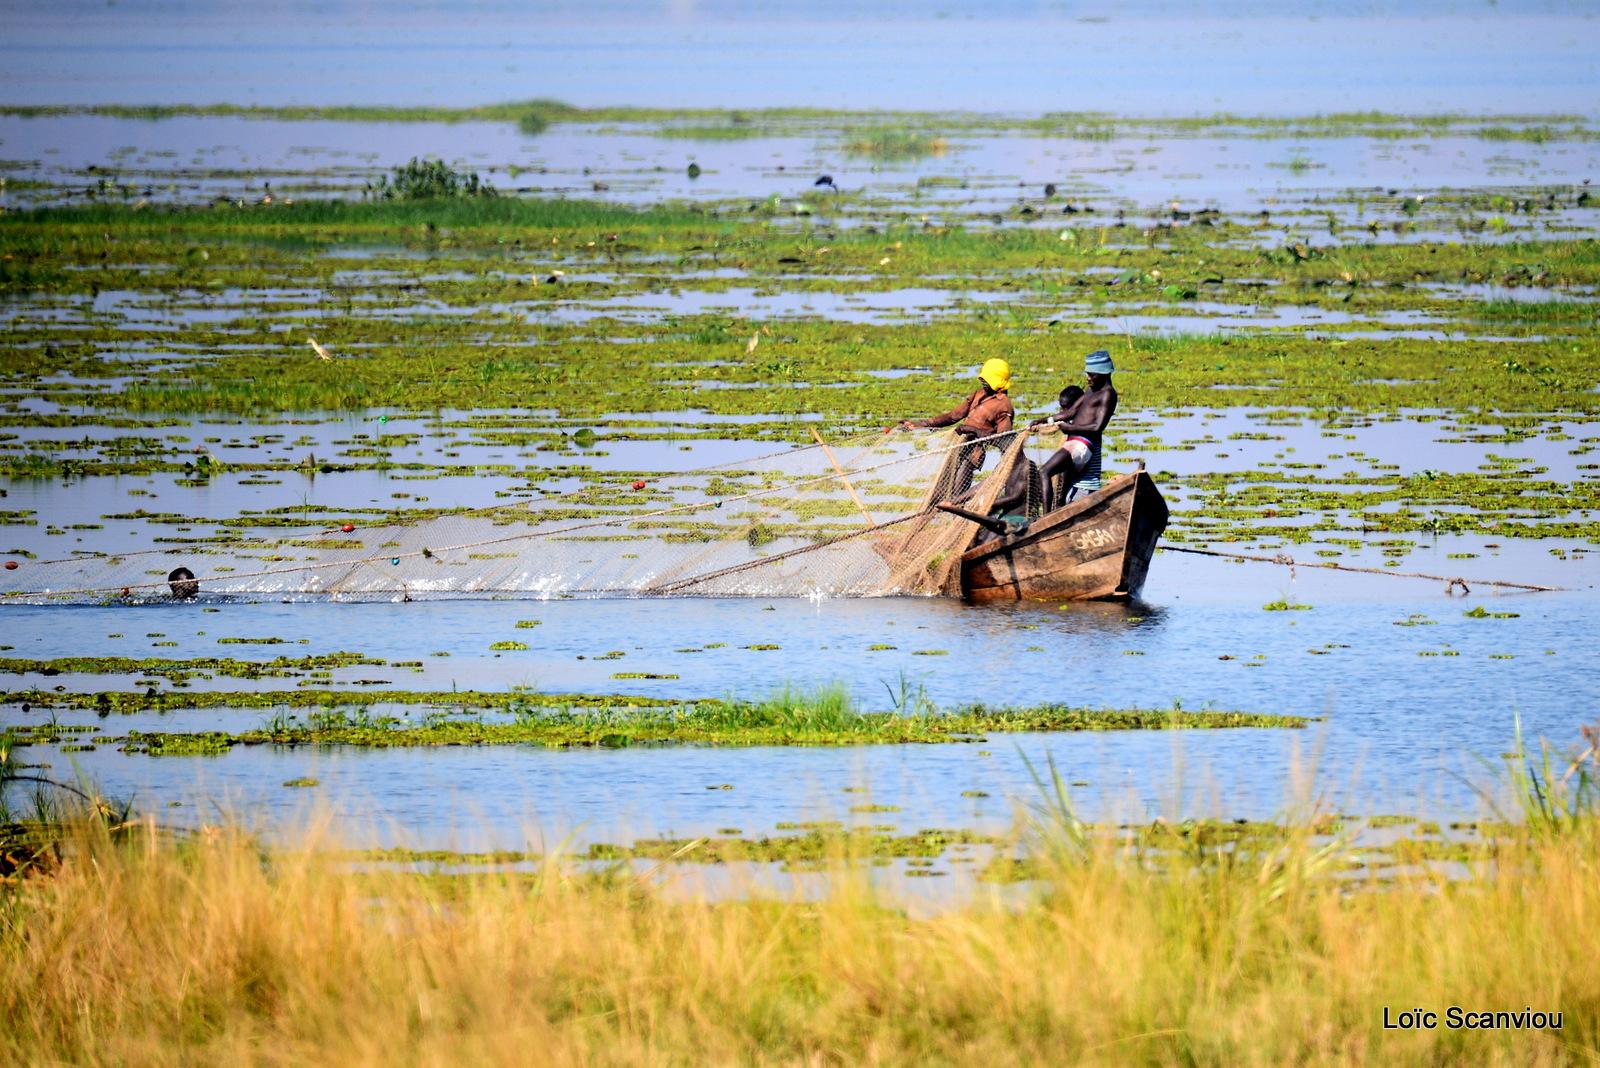 Pêcheurs/Fishermen (2)